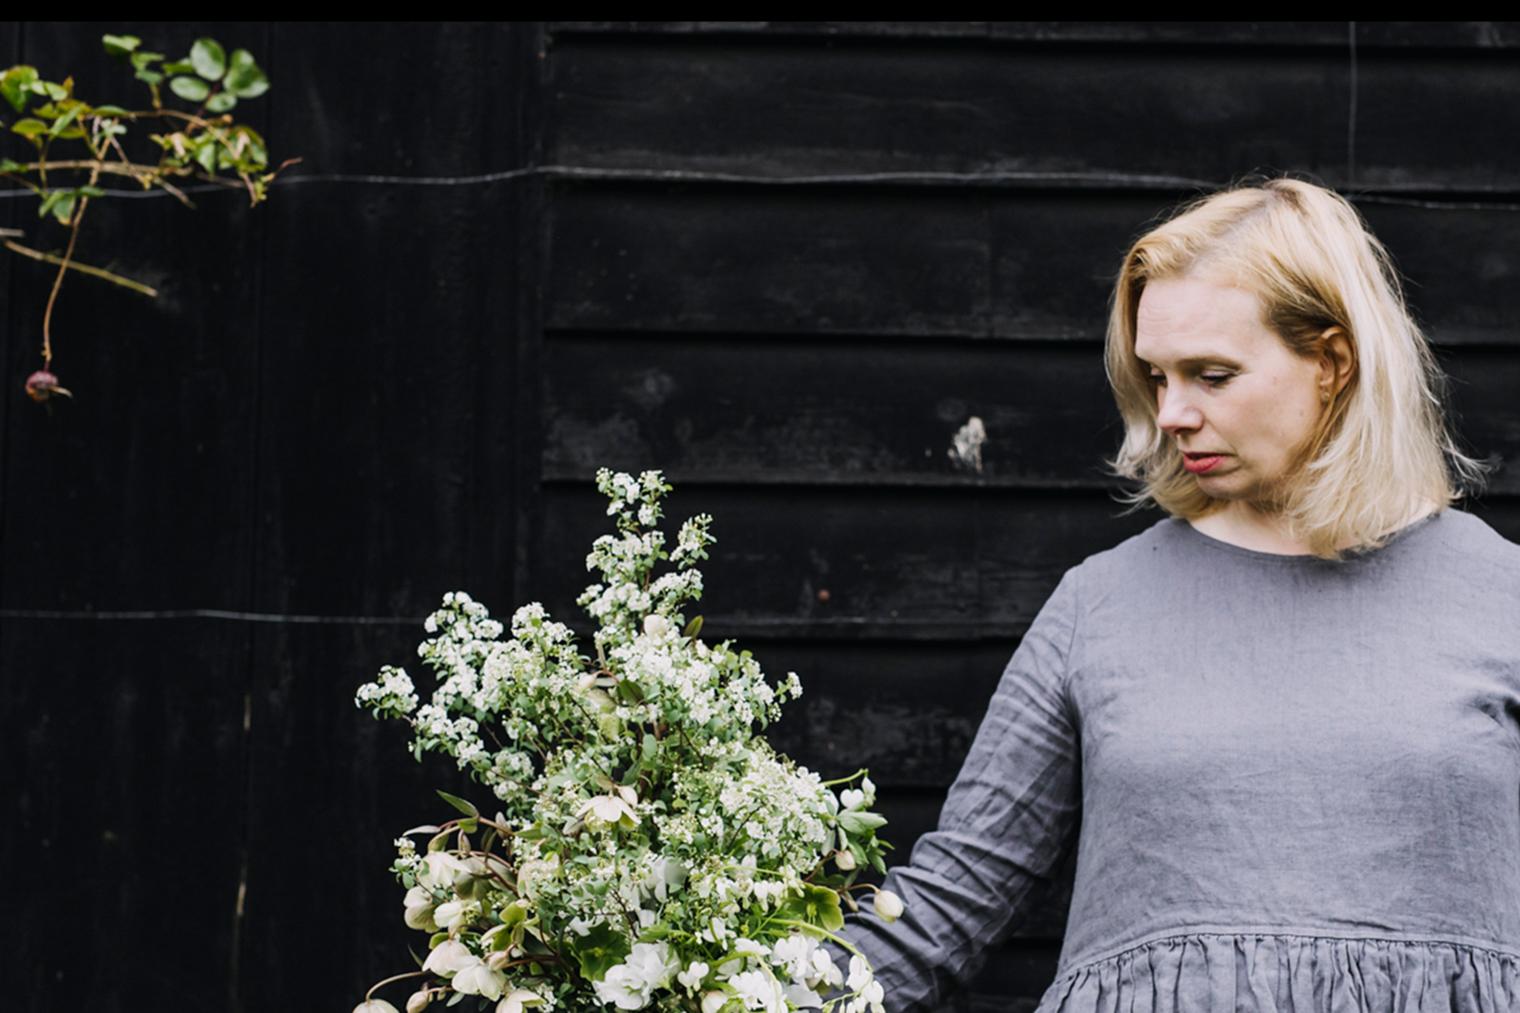 Claire Bowen Honeysuckle & Hilda   7 floristry podcast episodes